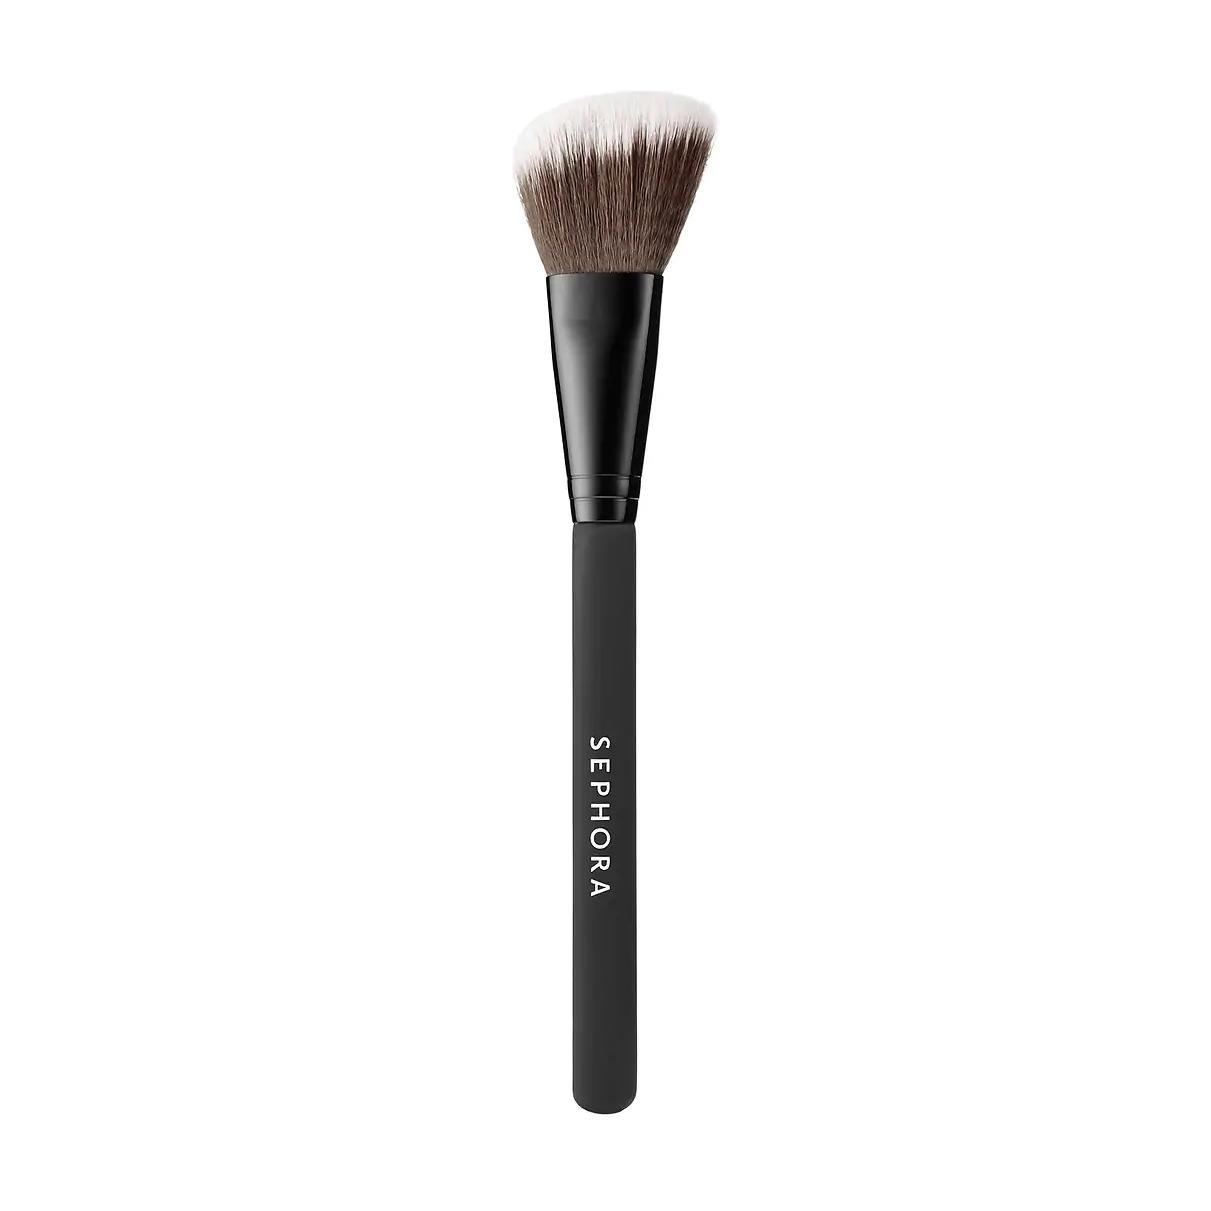 Sephora Ready To Roll Angled Blush Brush